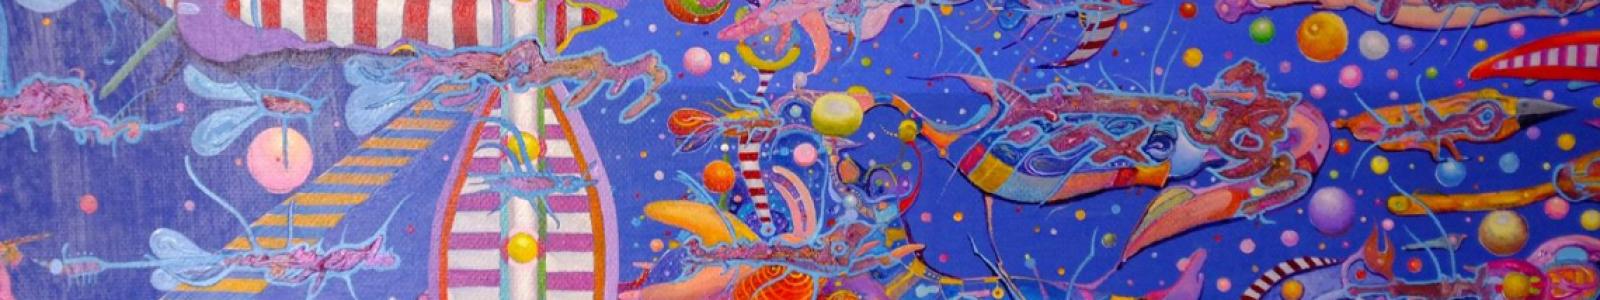 Gallery Painter Boris Gusev